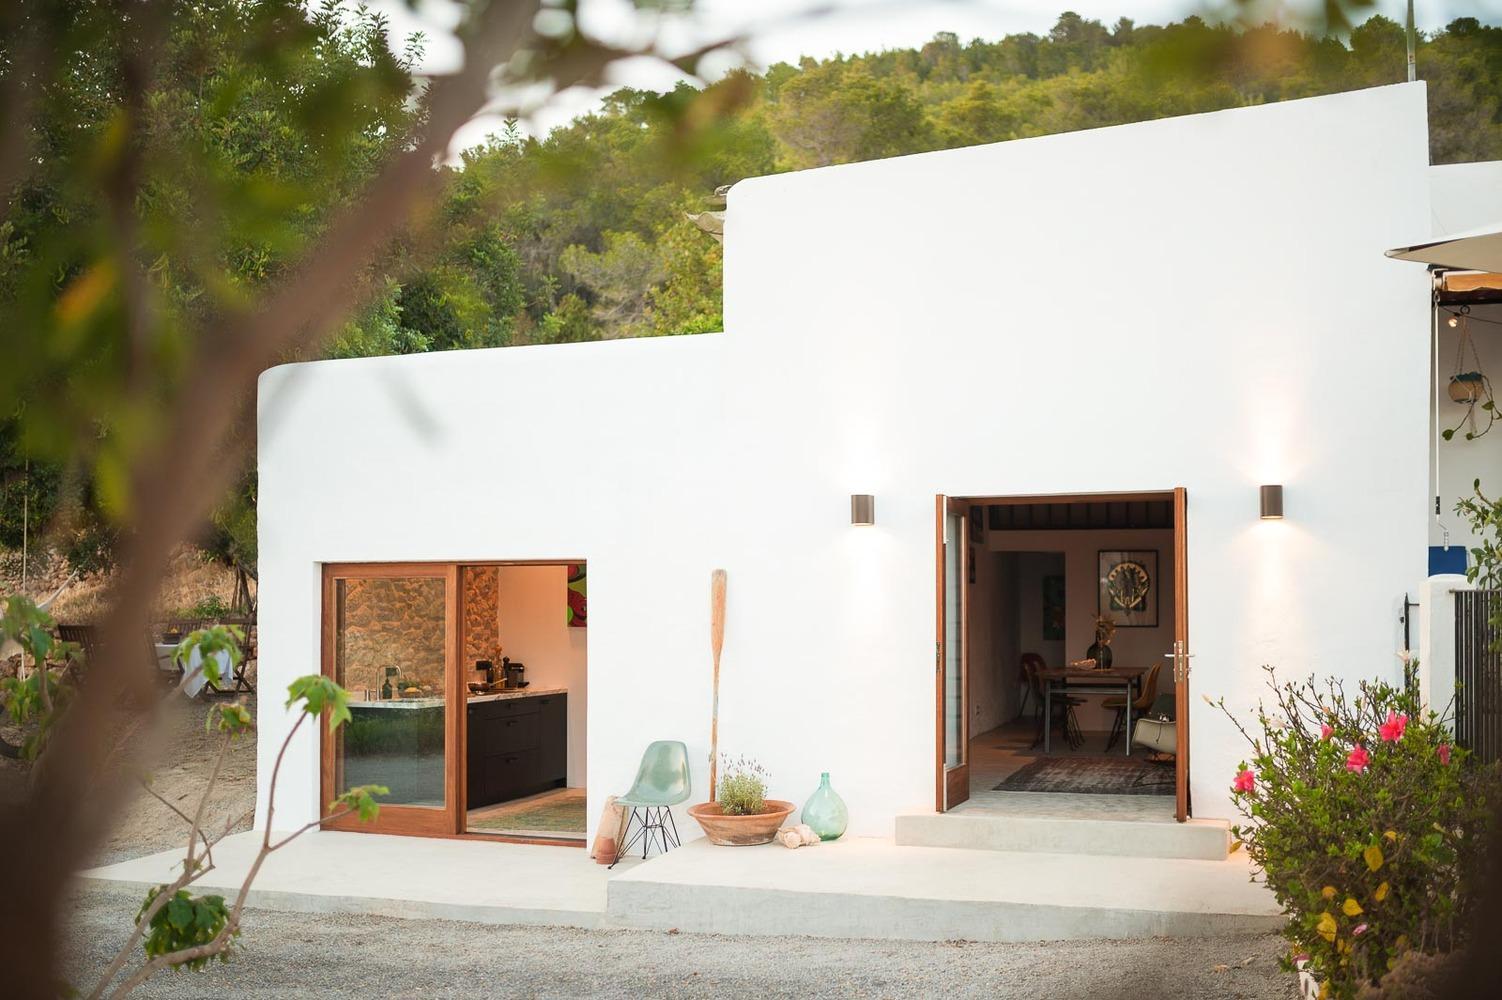 The Ibiza Campo House by Standard Studio   Photo © Youri Claessens